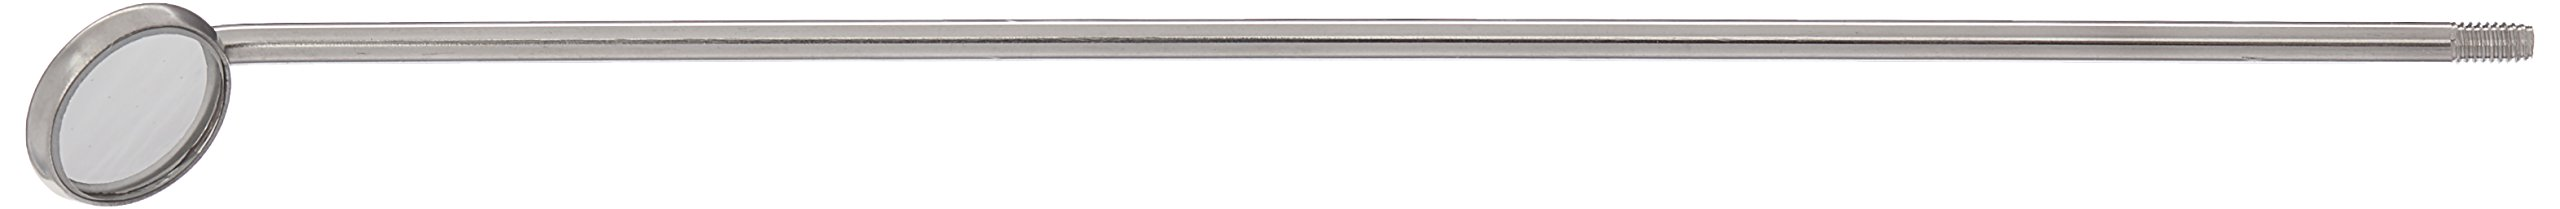 Grafco 1192-1#00 Laryngeal Mirror, 12 mm